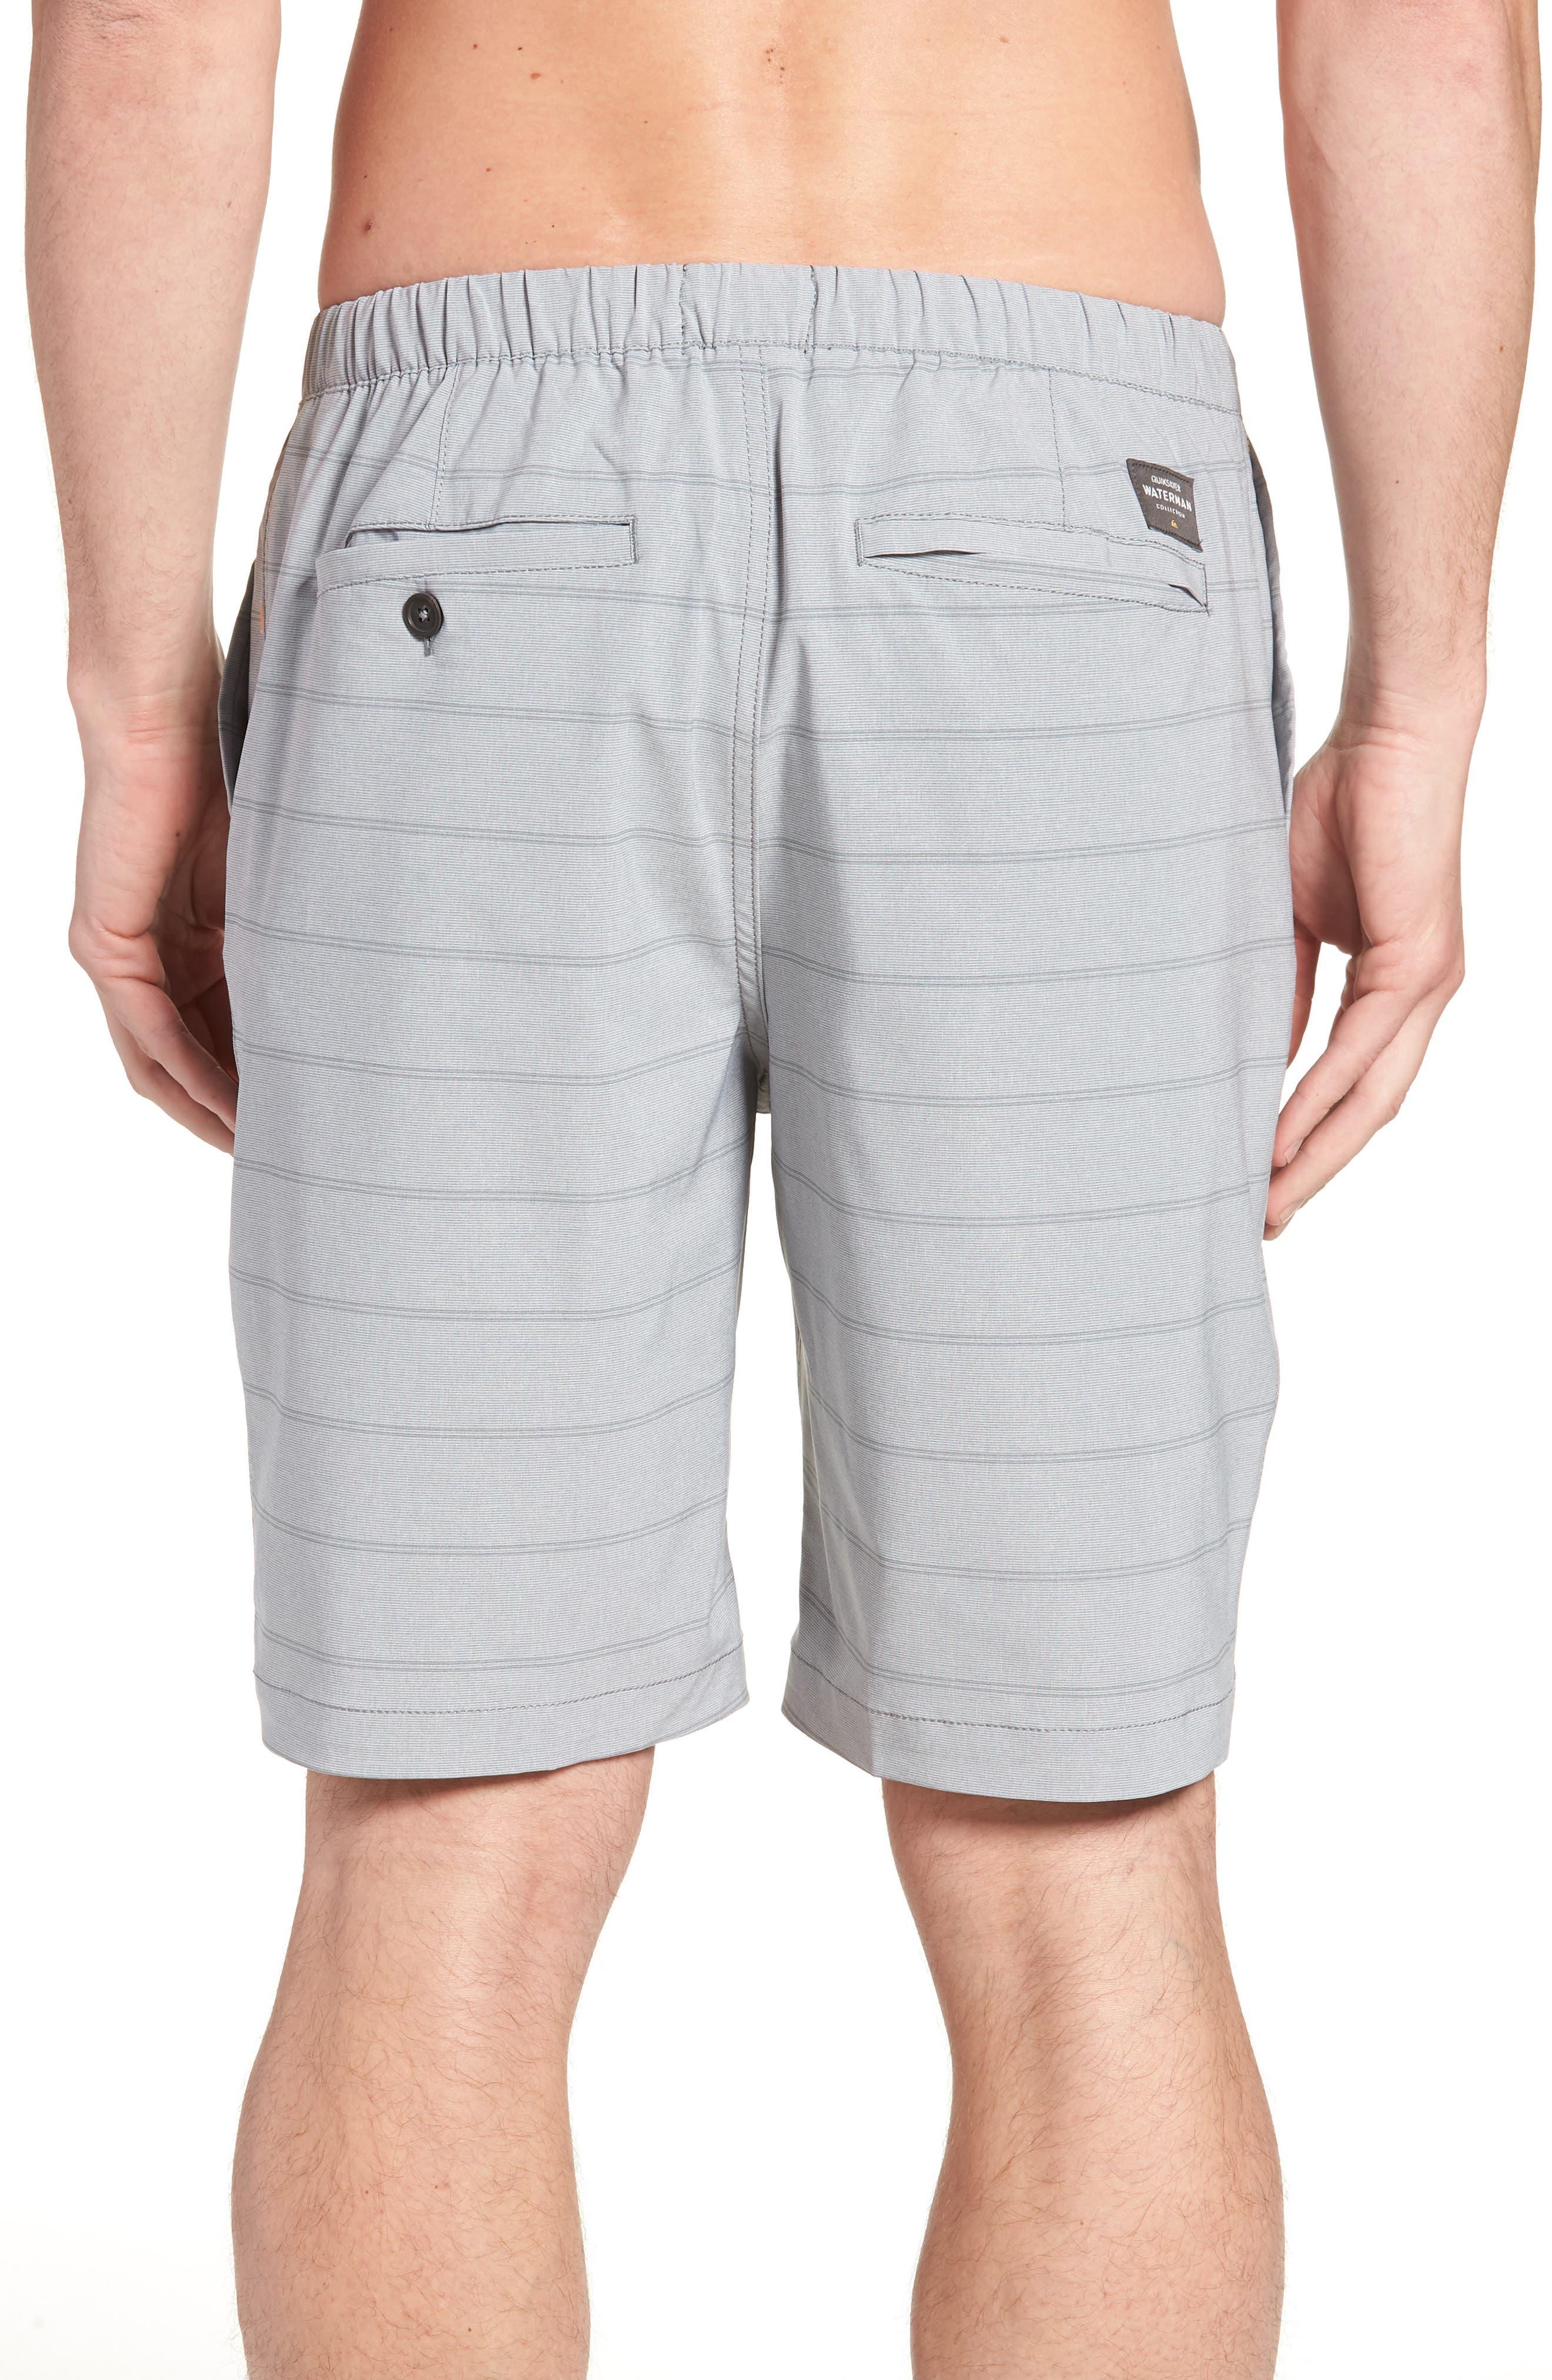 Suva Amphibian Hybrid Shorts,                             Alternate thumbnail 2, color,                             STEEPLE GRAY